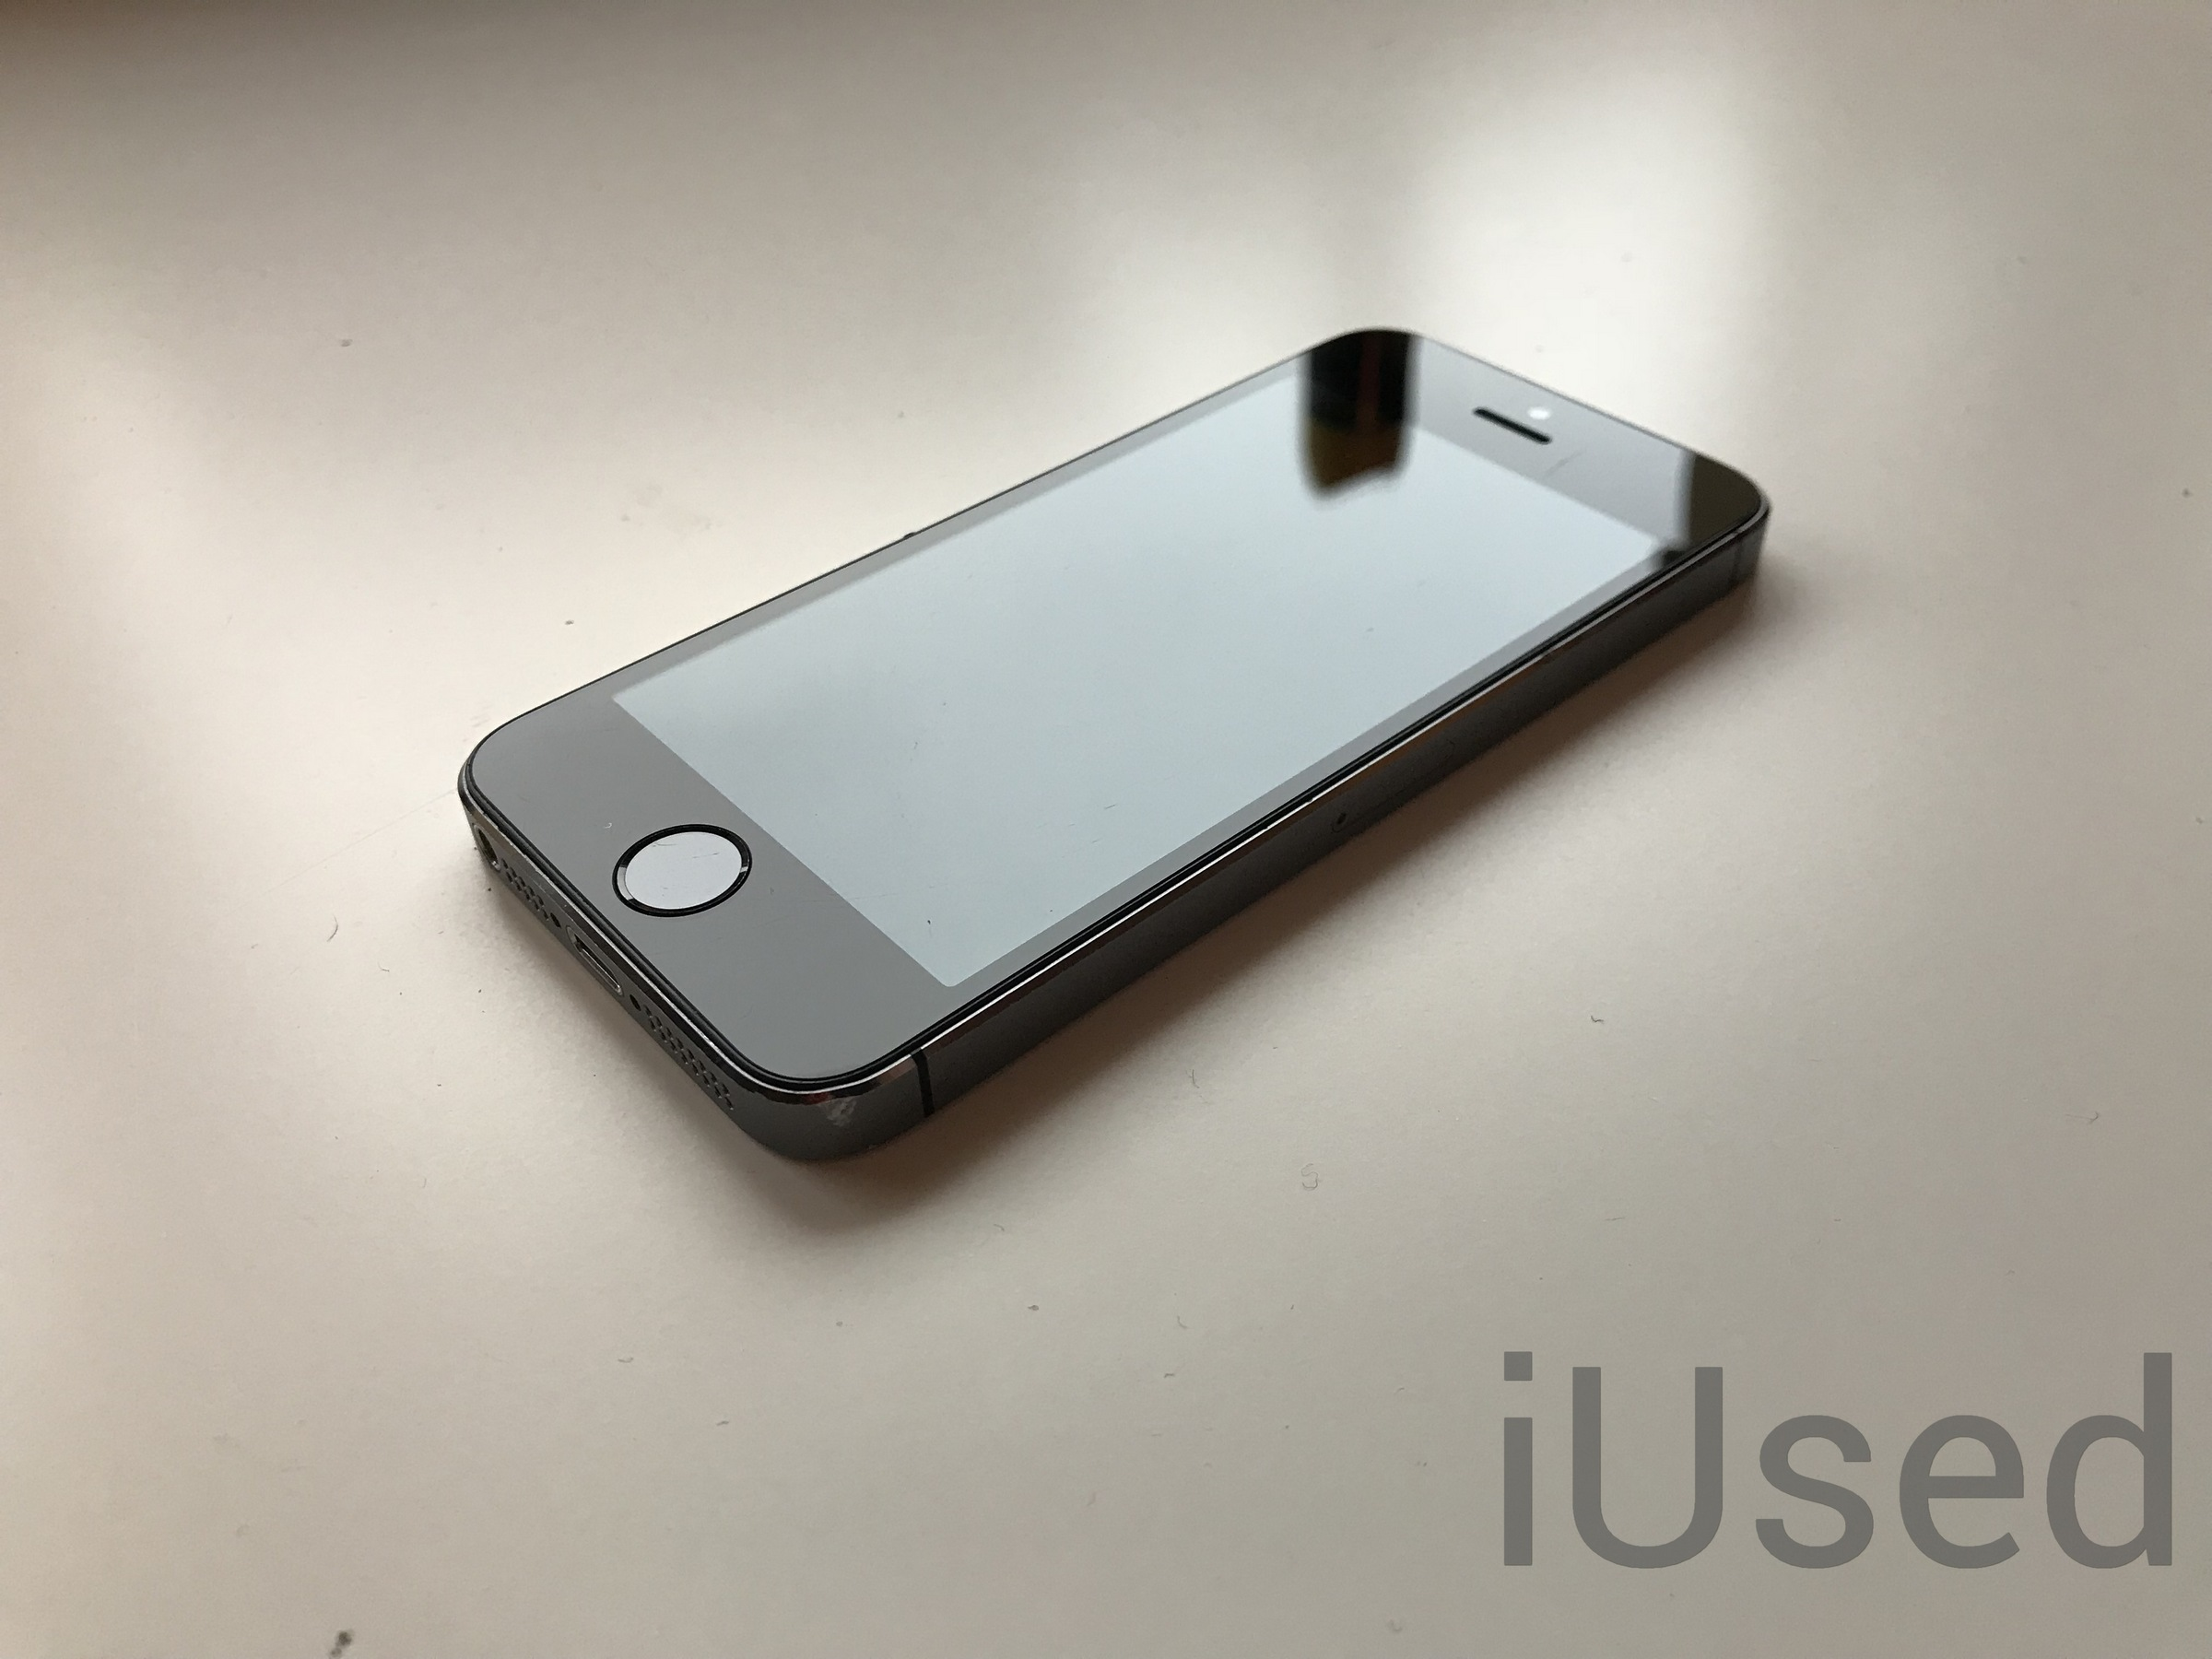 Apple iPhone 5S Space Grey 32GB od iUsed GW12M